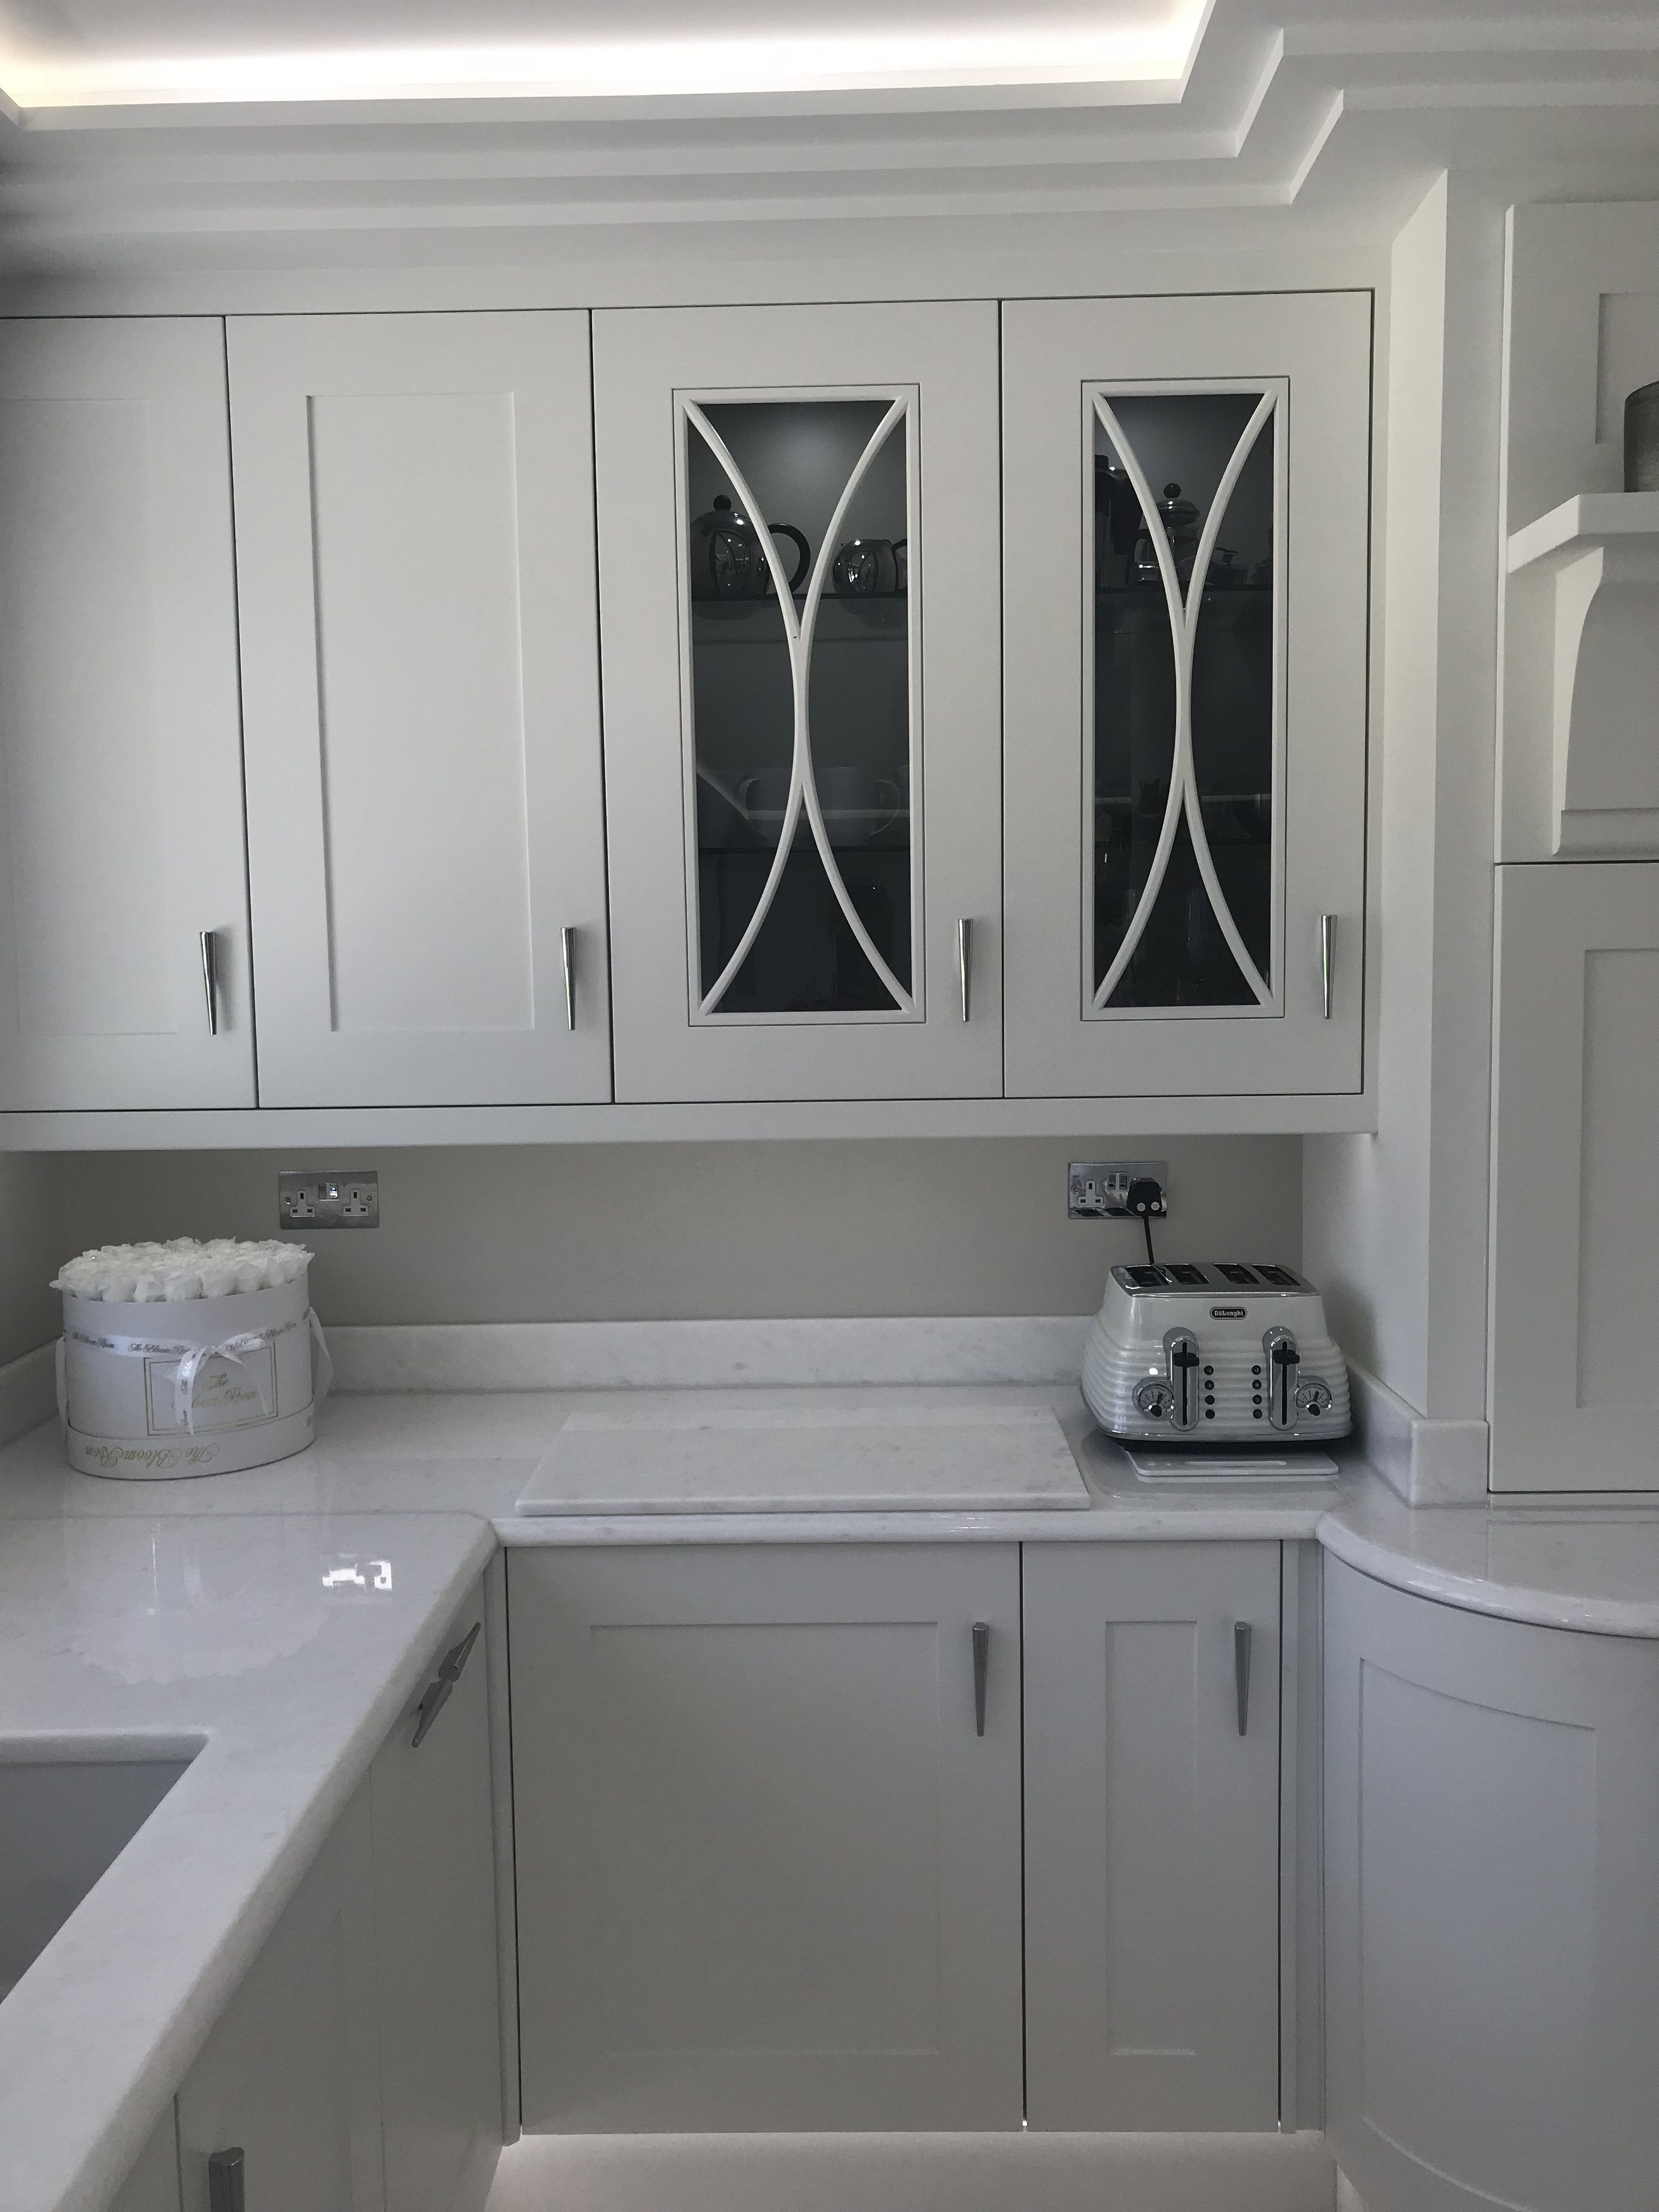 Kitchen Remodel Handcrafted Kitchens Clive Anderson Furniture In 2020 Anderson Furniture Fridge Design Kitchen